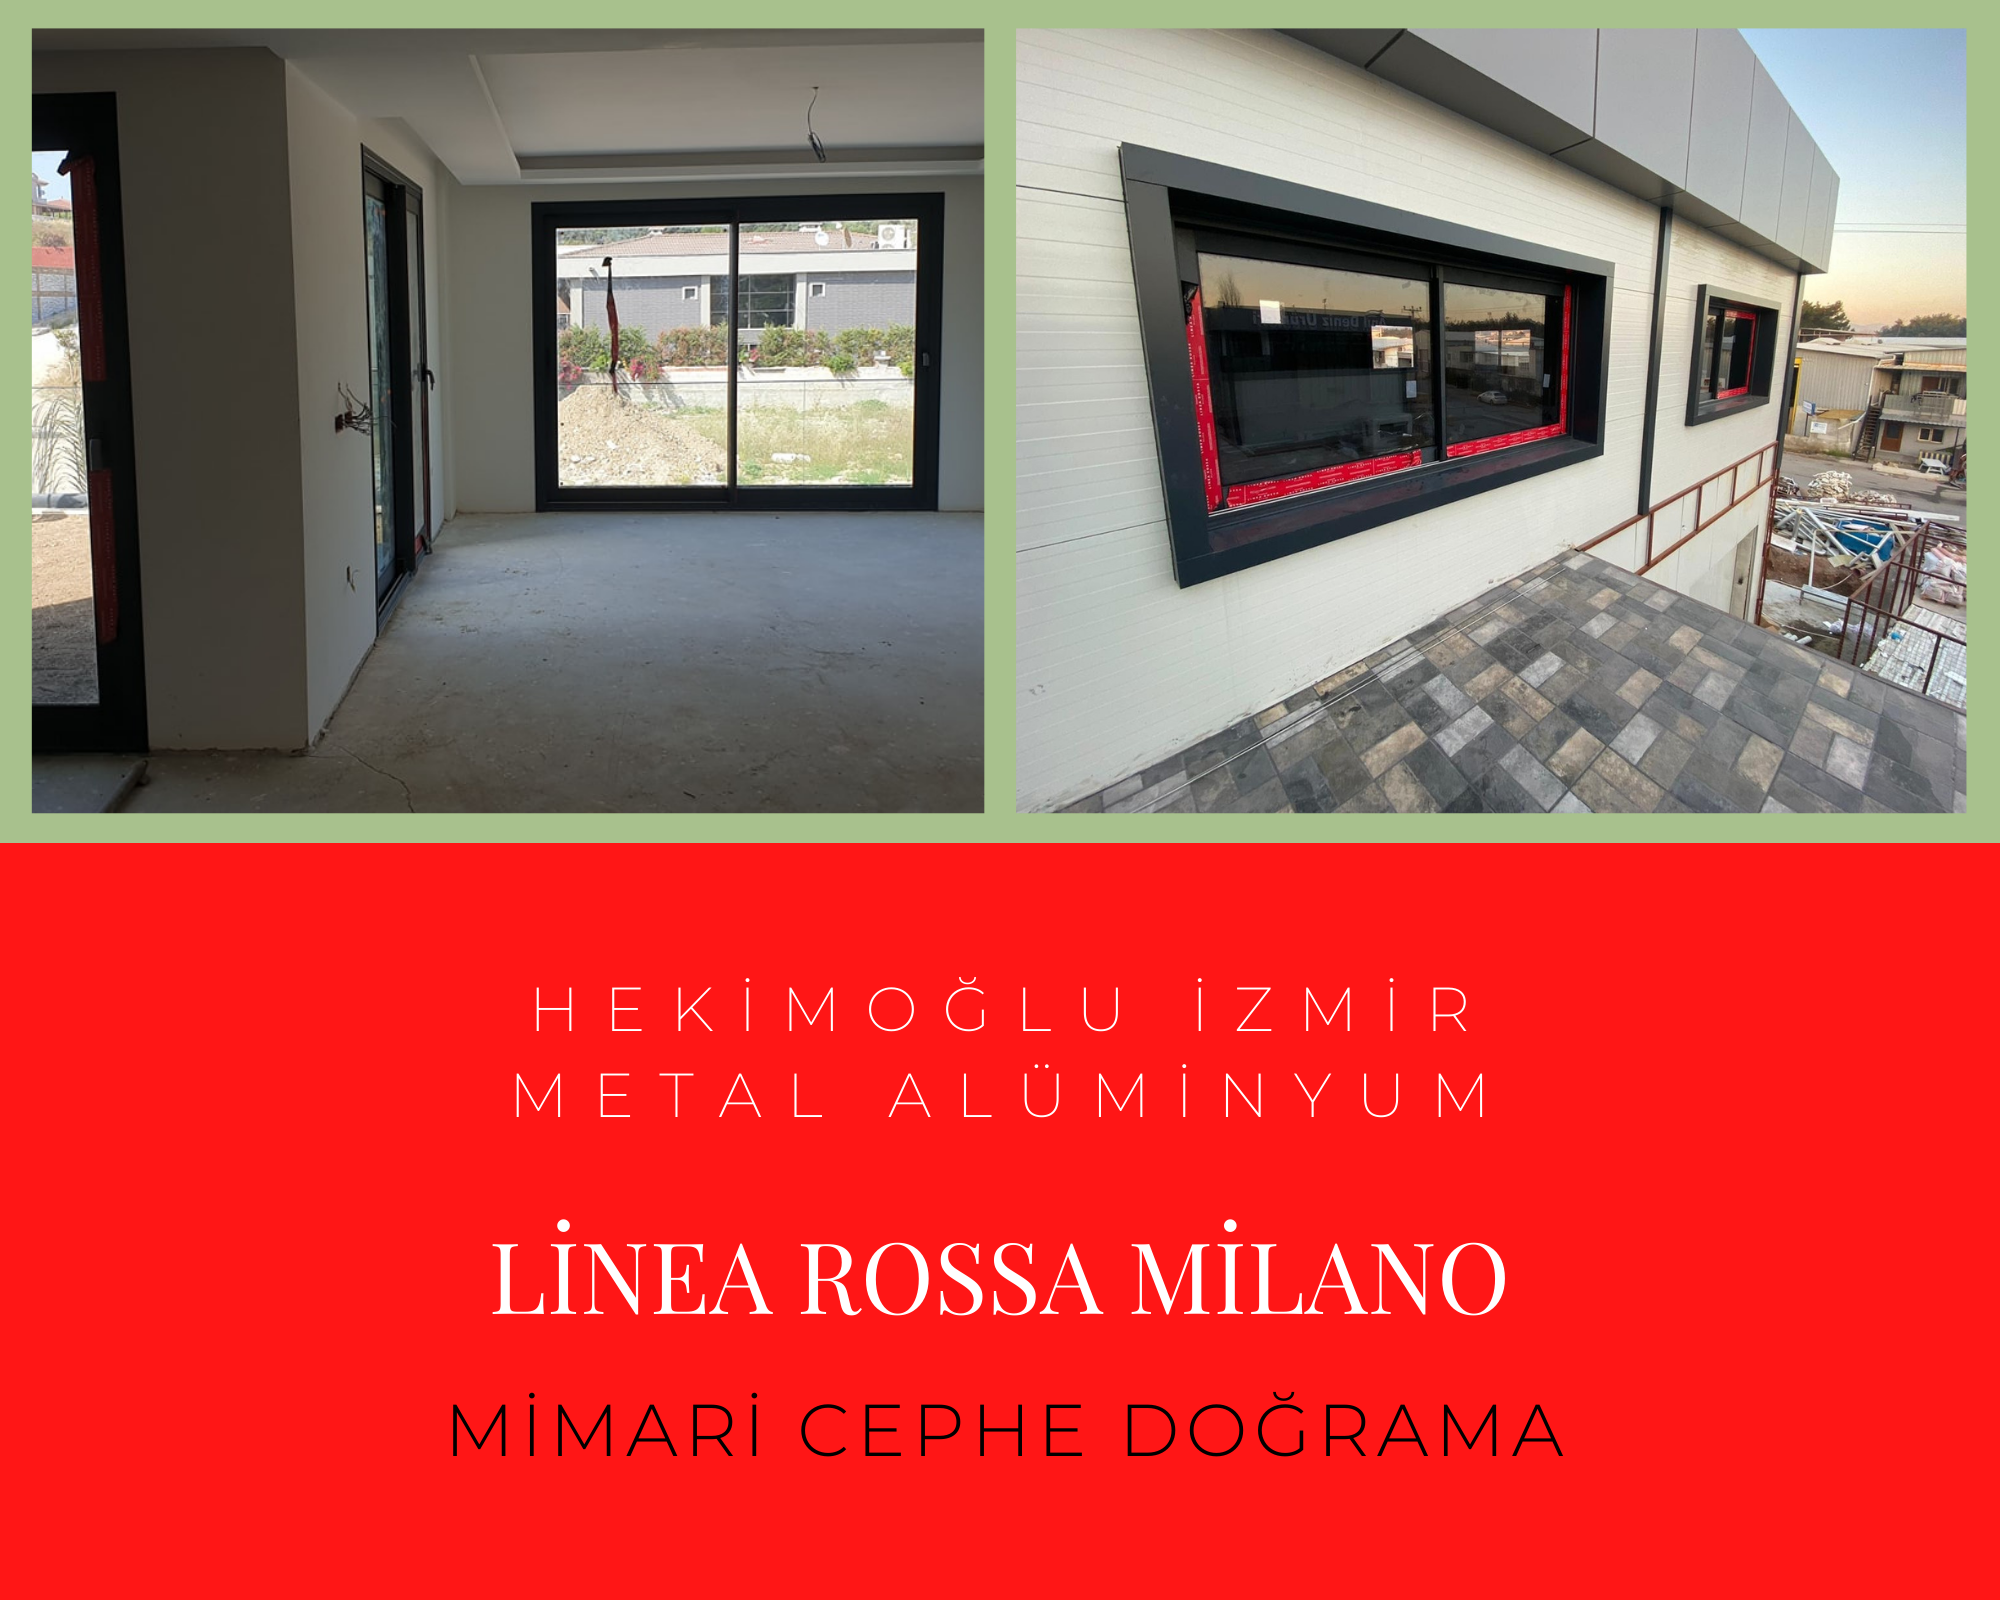 Linea Rossa Milano